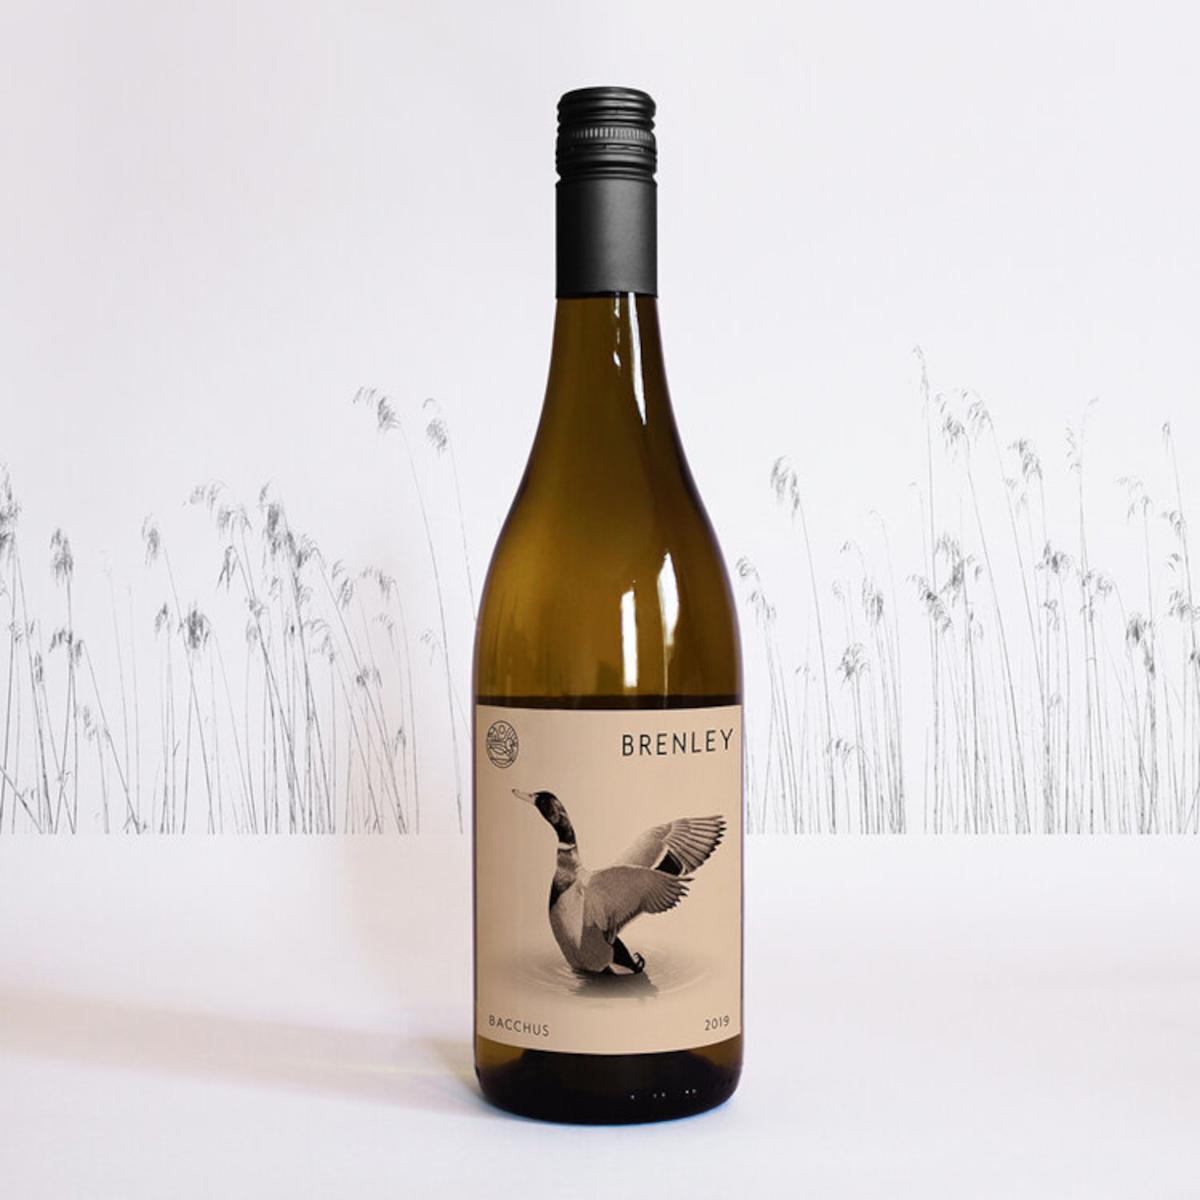 Brenley Wine, produced at Brenley Farm, Faversham